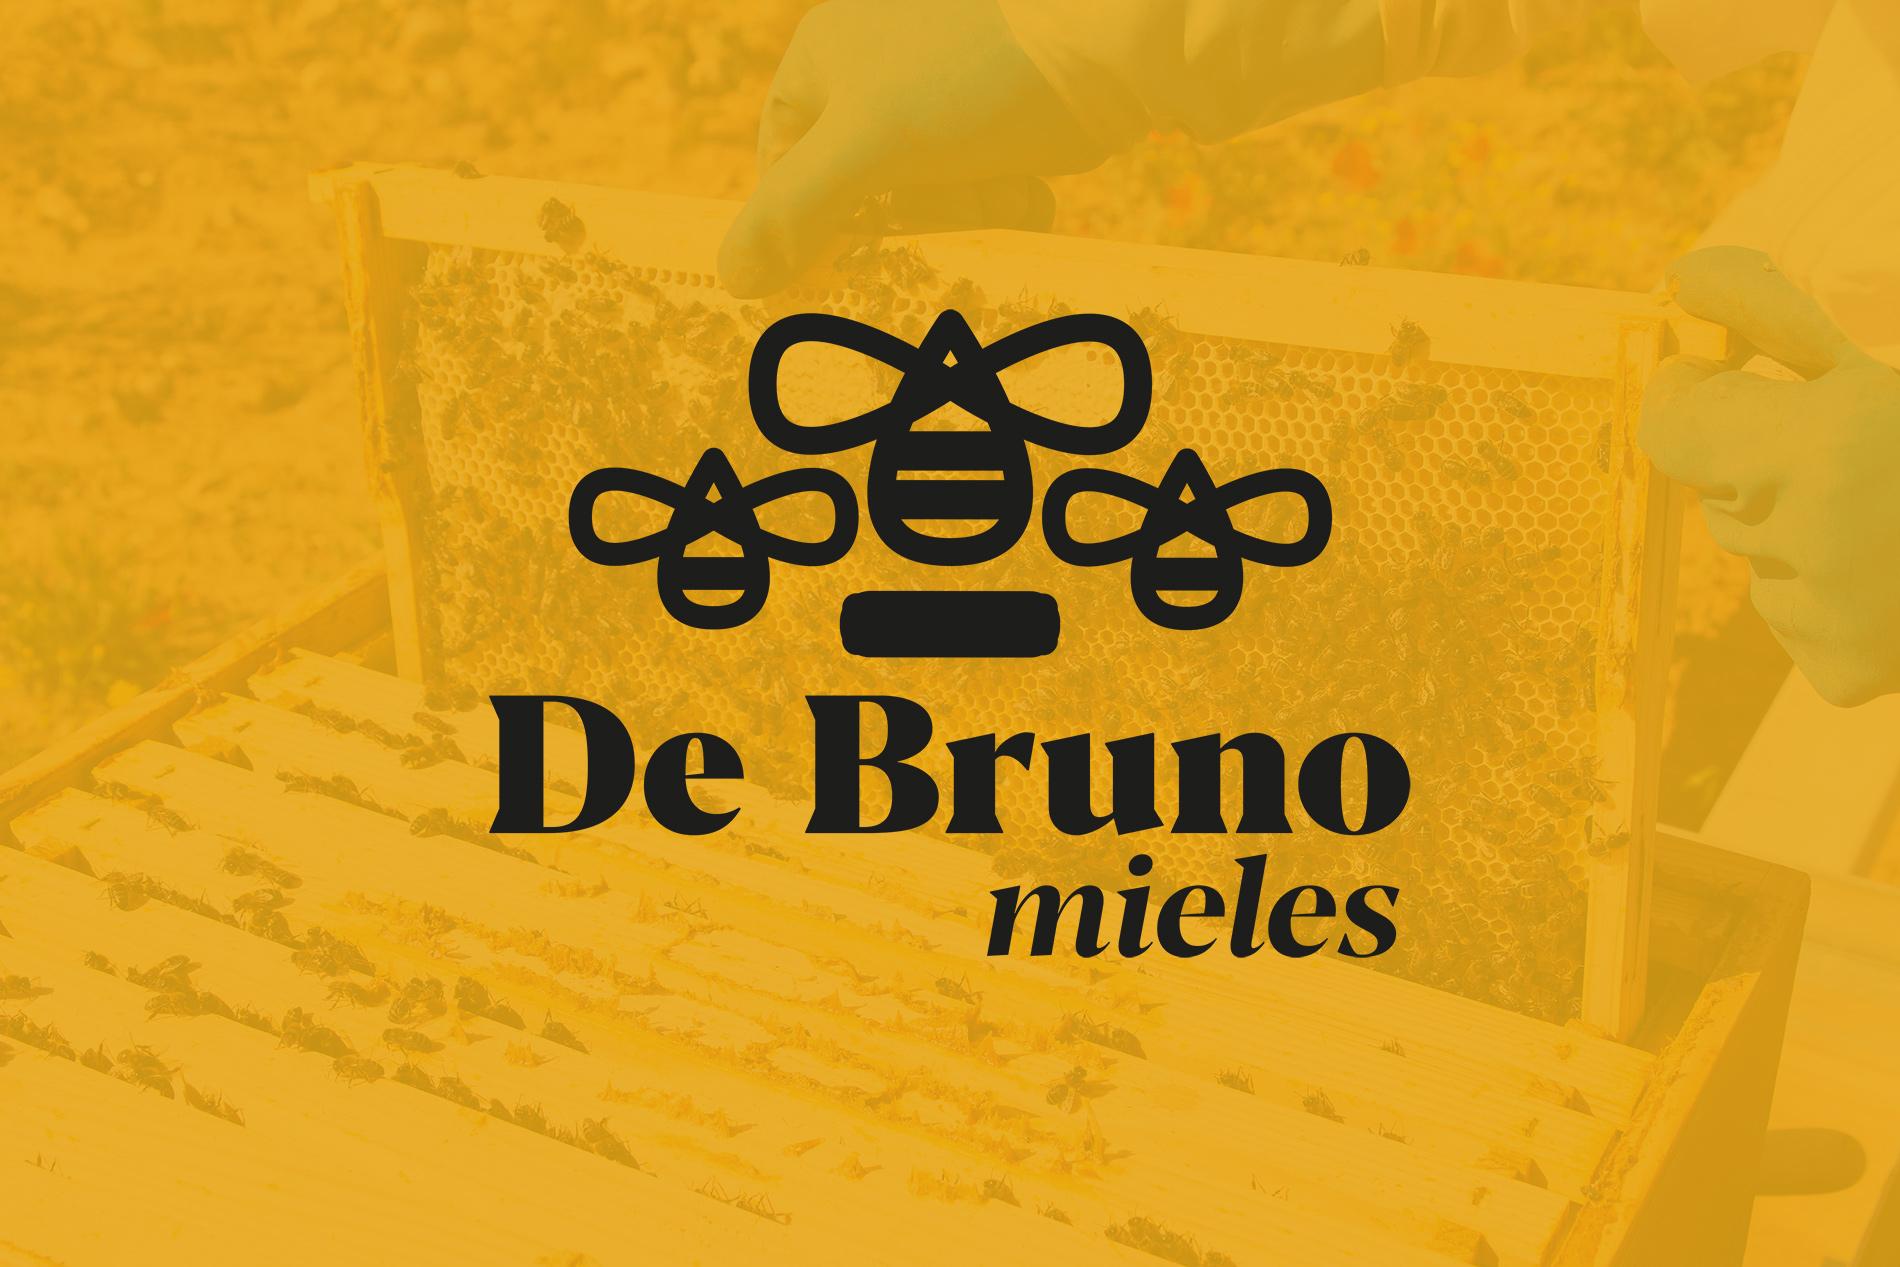 Bruno Mieles